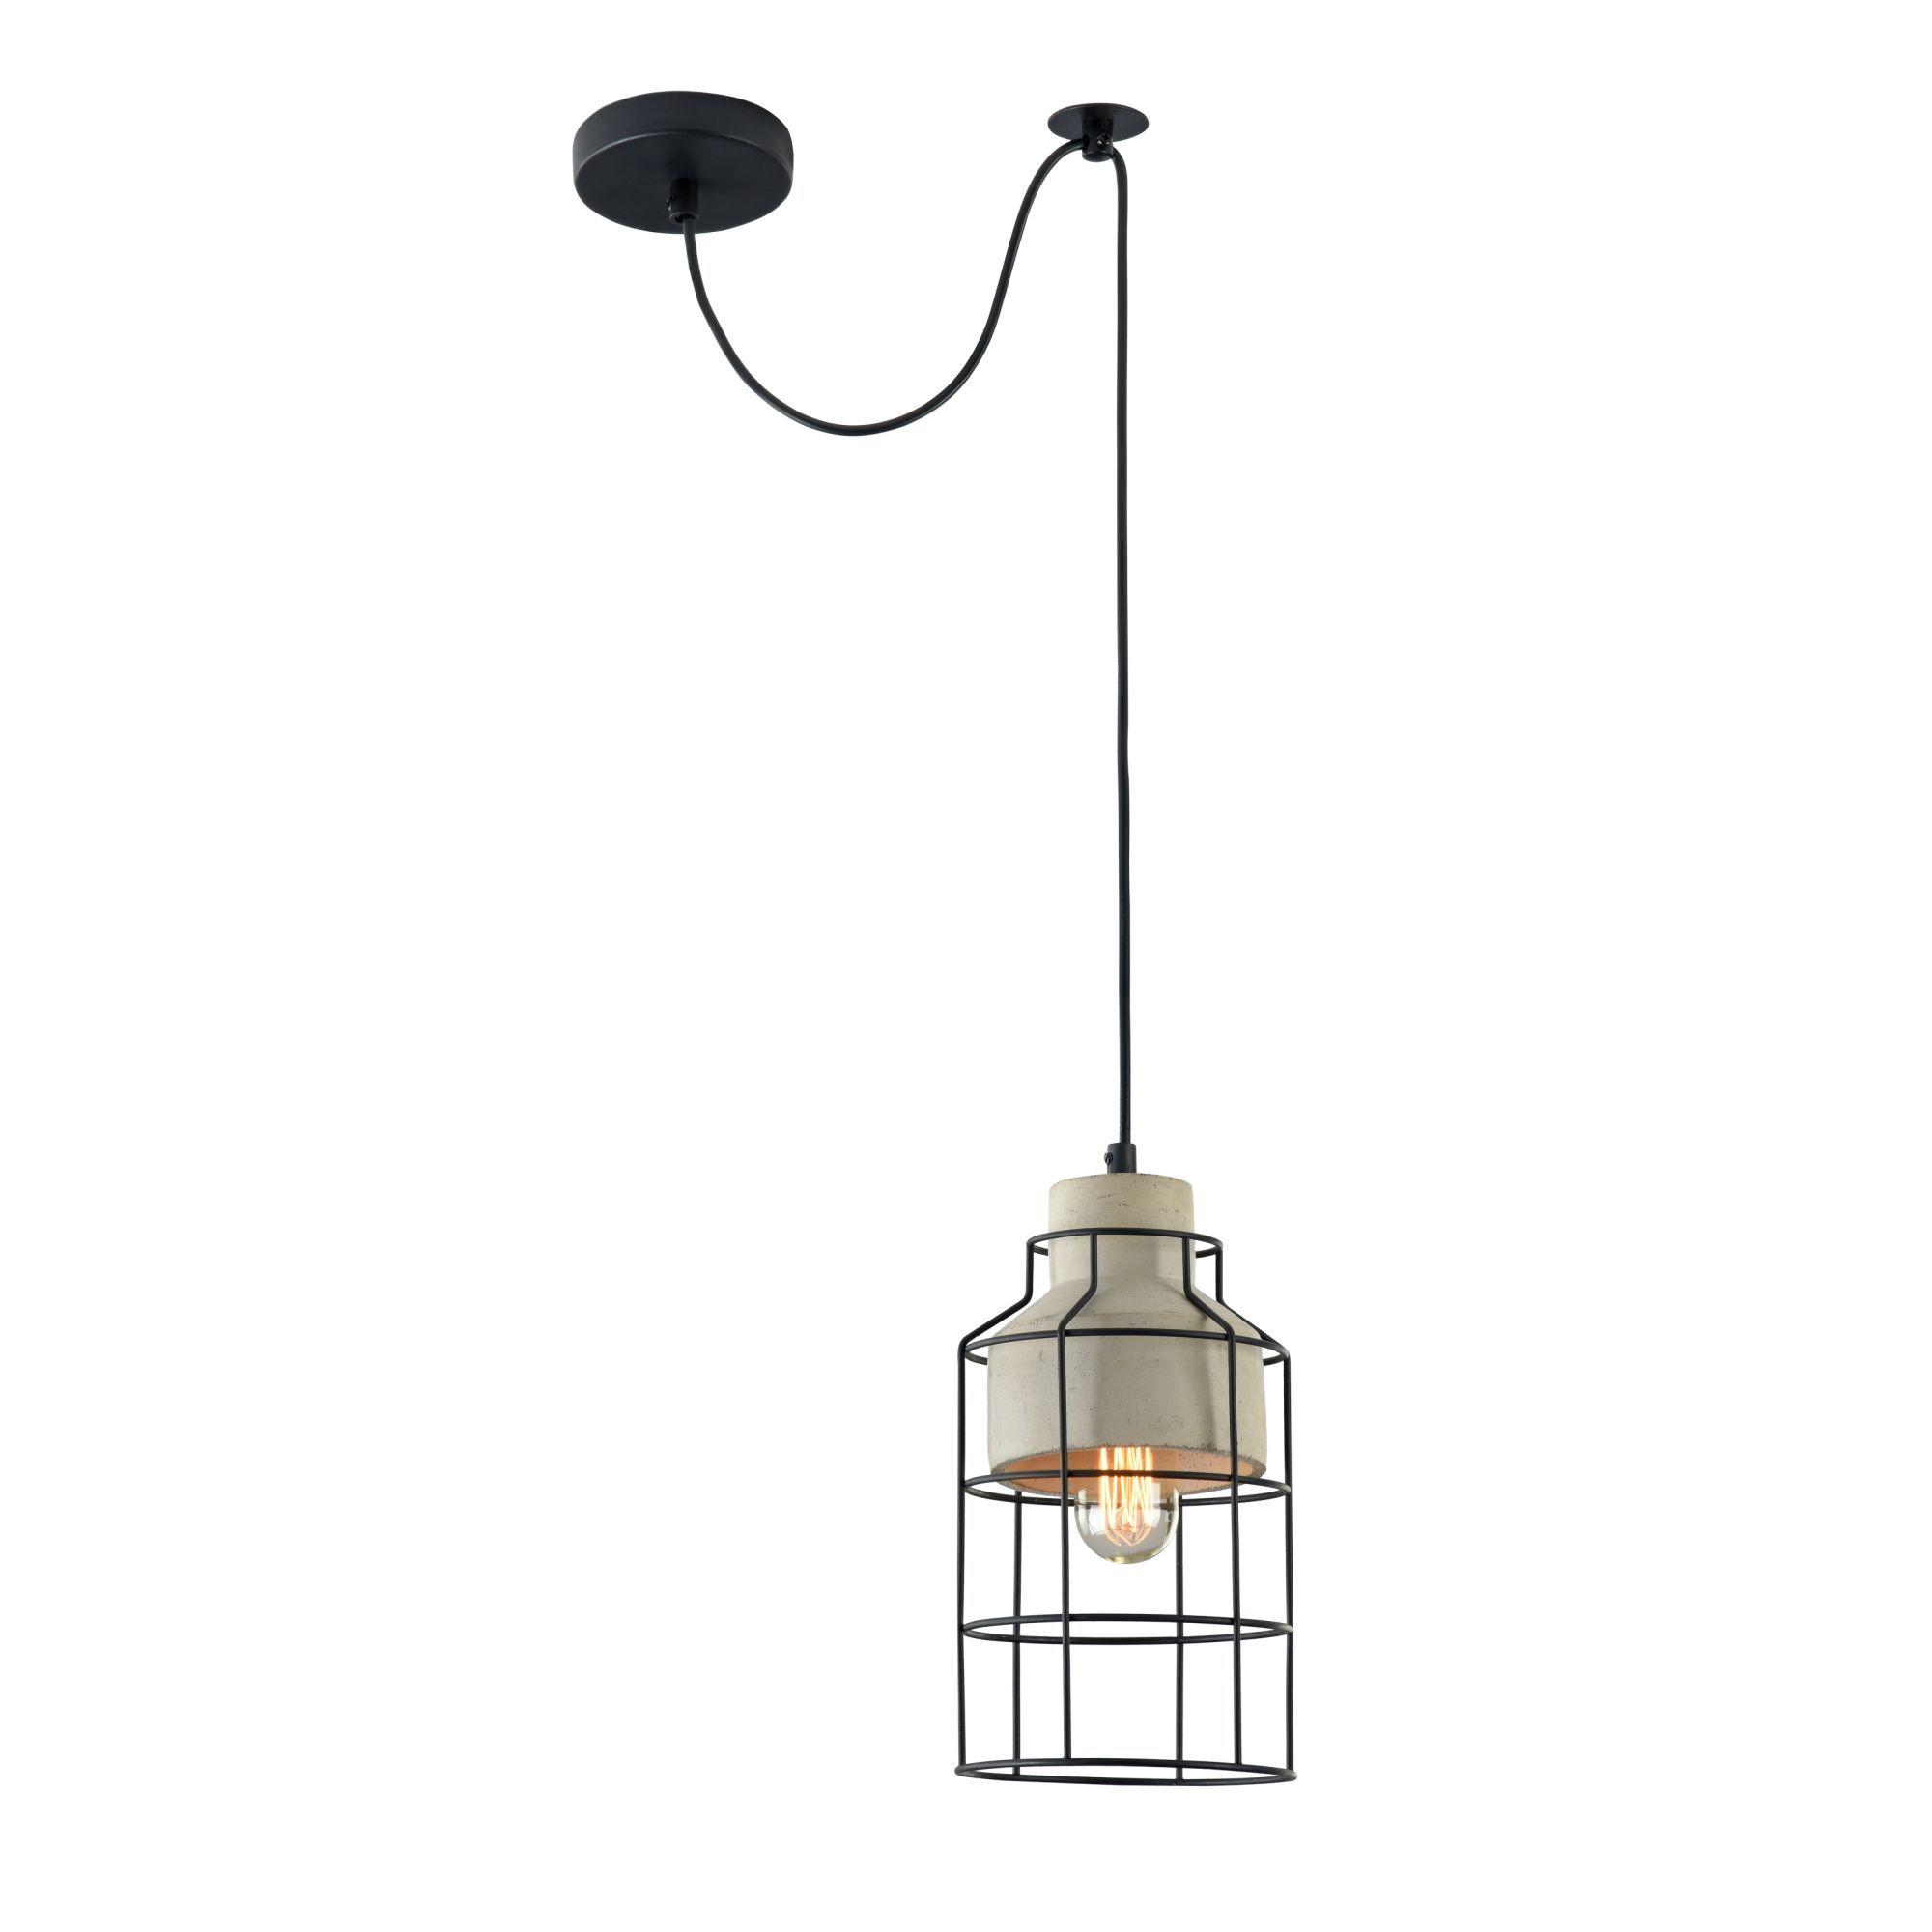 Подвесной светильник Maytoni Gosford T441-PL-01-GR, 1xE27x60W, черный, серый, металл, бетон - фото 1